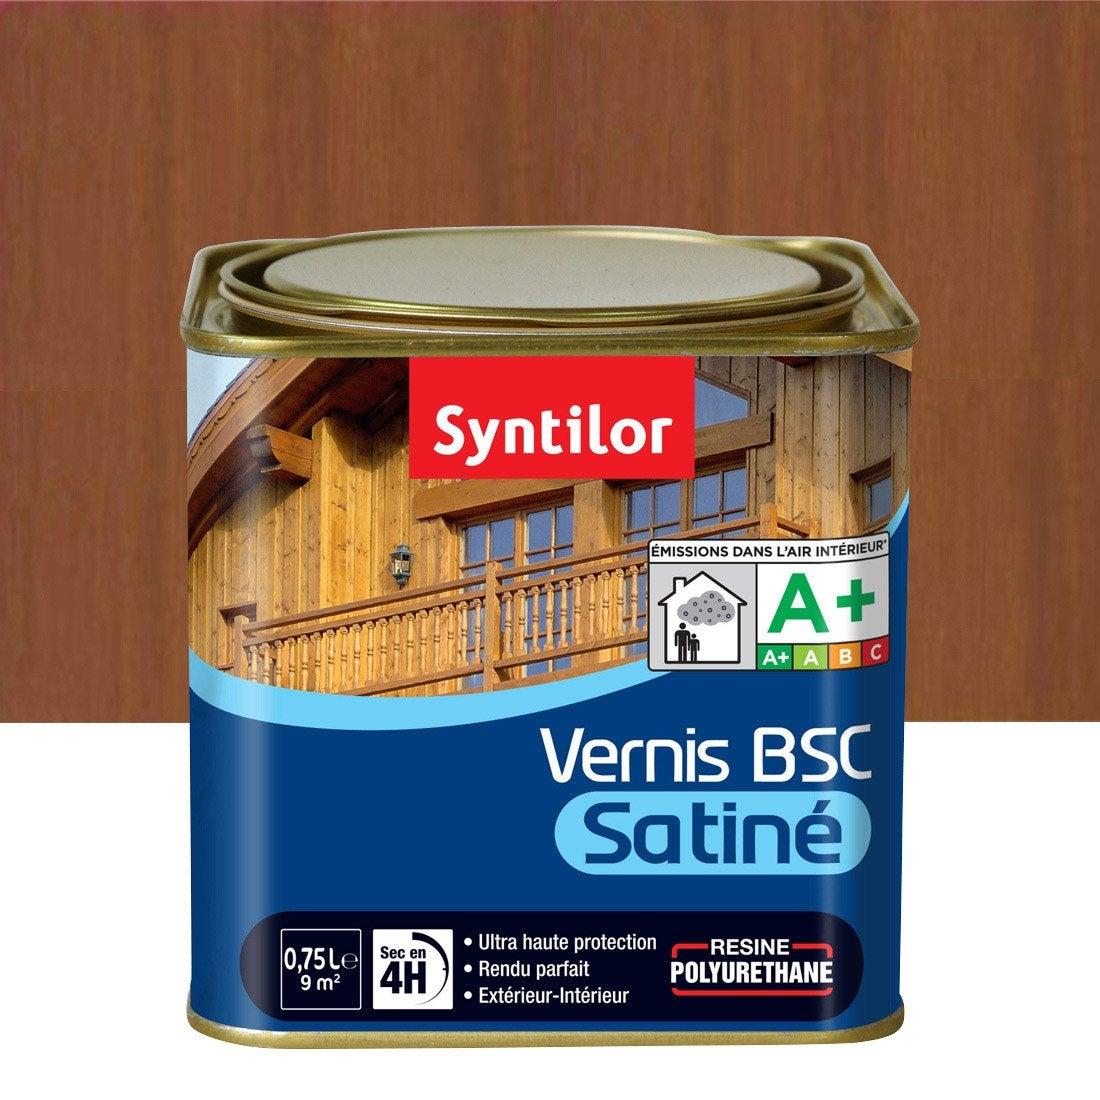 vernis syntilor vernis bois syntilor 0 75l satin chen moy l ch ne moyen leroy merlin. Black Bedroom Furniture Sets. Home Design Ideas